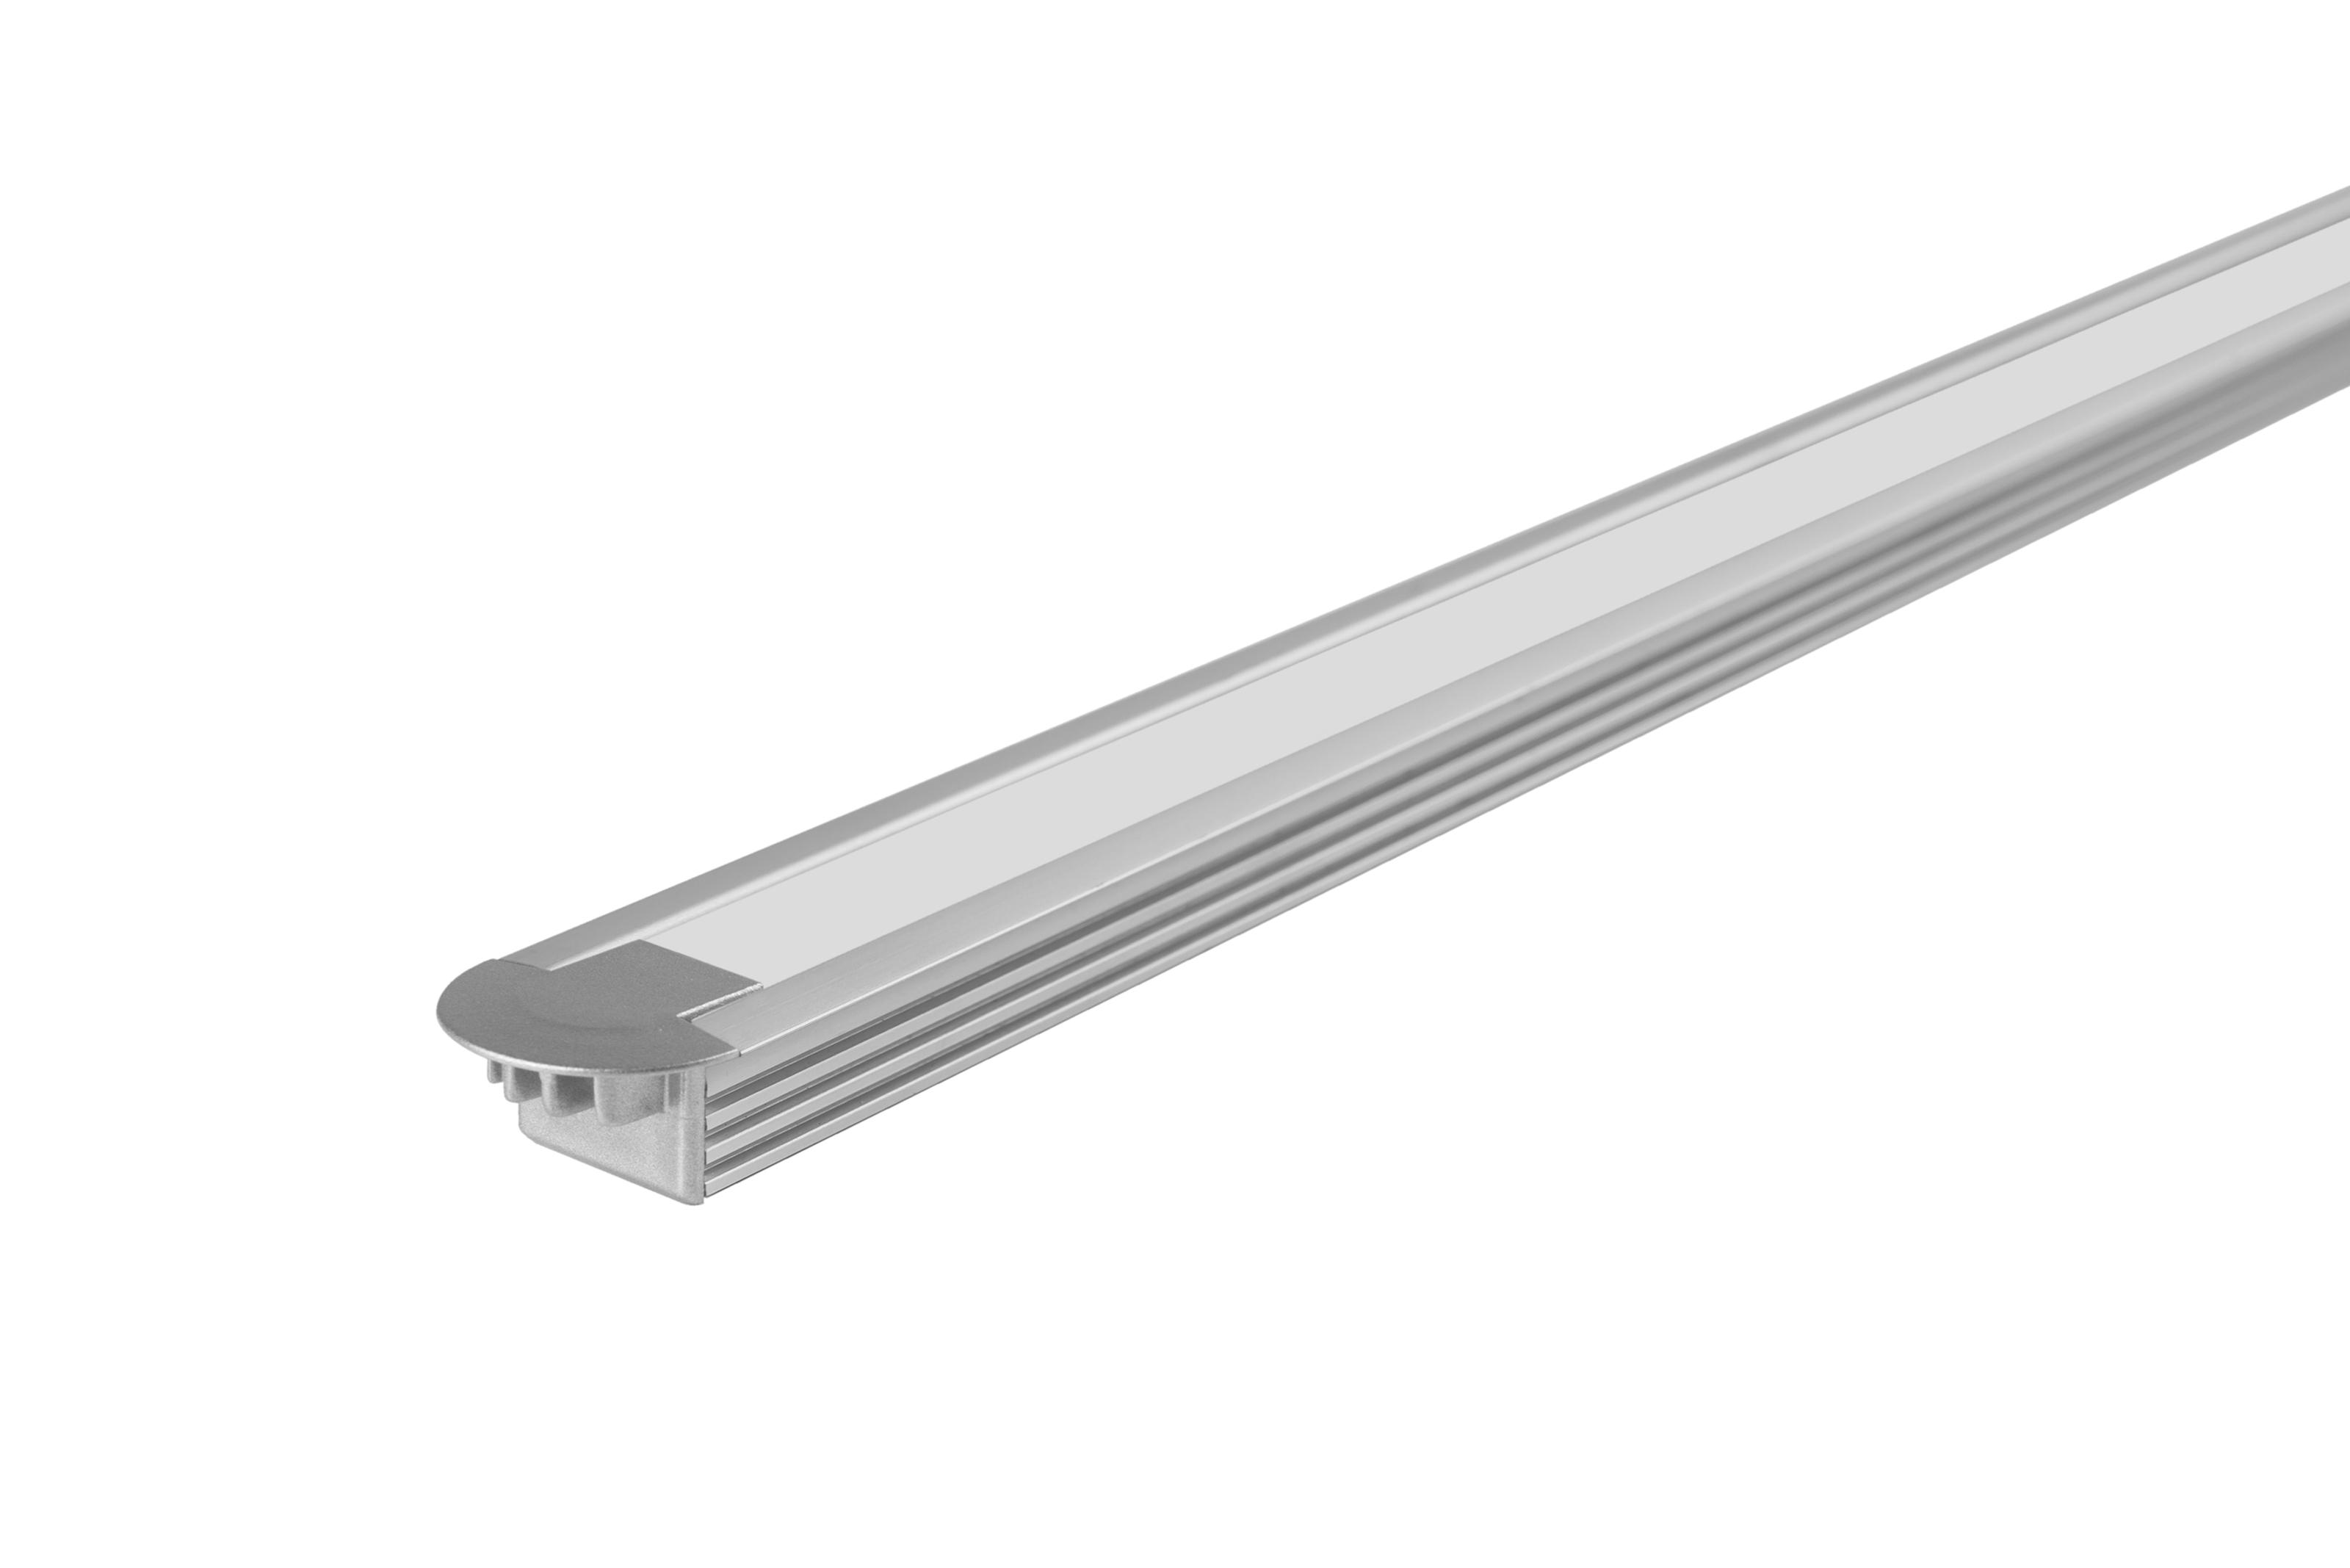 lightline-mini-square-f-1-mj-lighting-v2